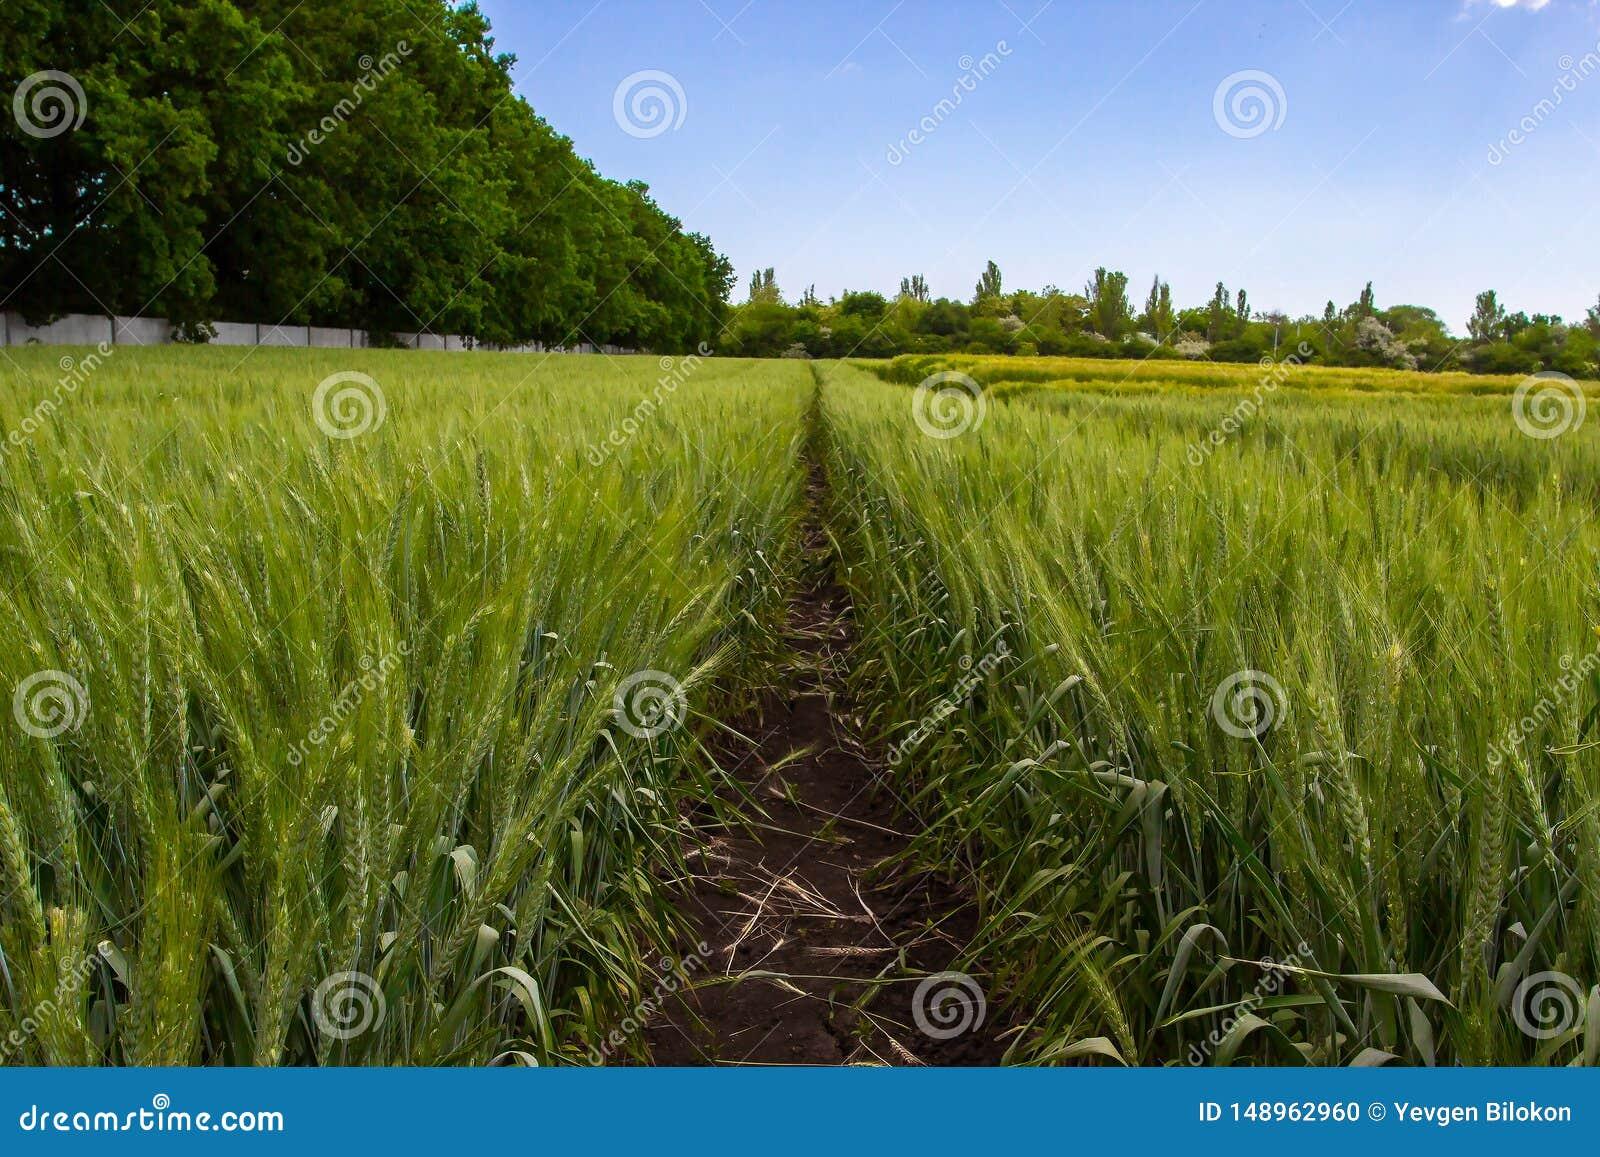 Gr?nes Weizenfeld umgeben durch Wald unter blauem Himmel